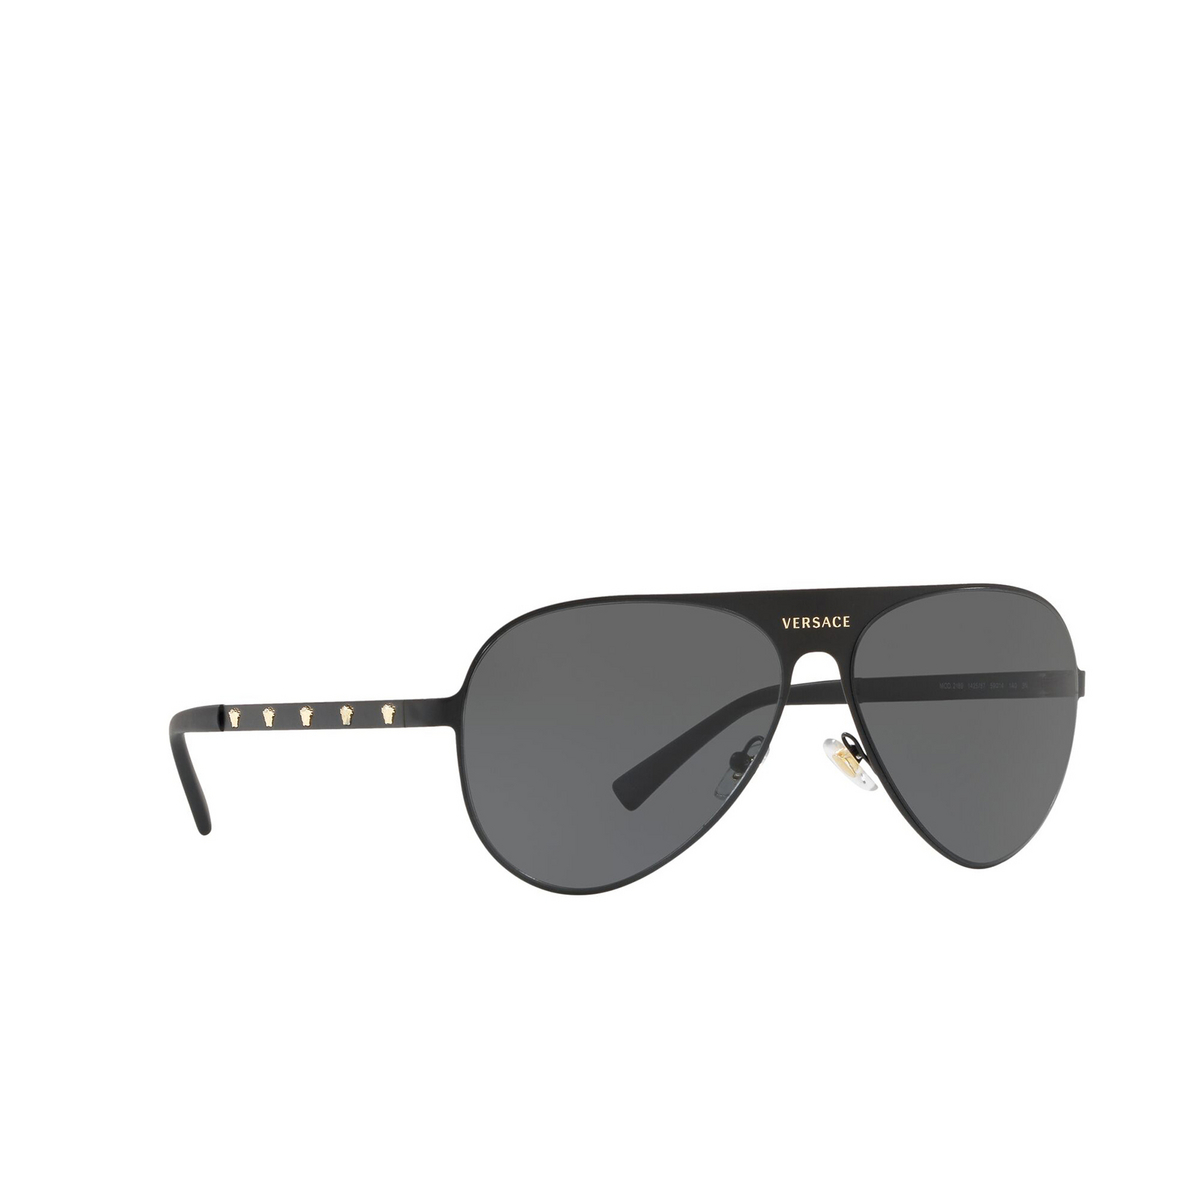 Versace® Aviator Sunglasses: VE2189 color Matte Black 142587 - three-quarters view.